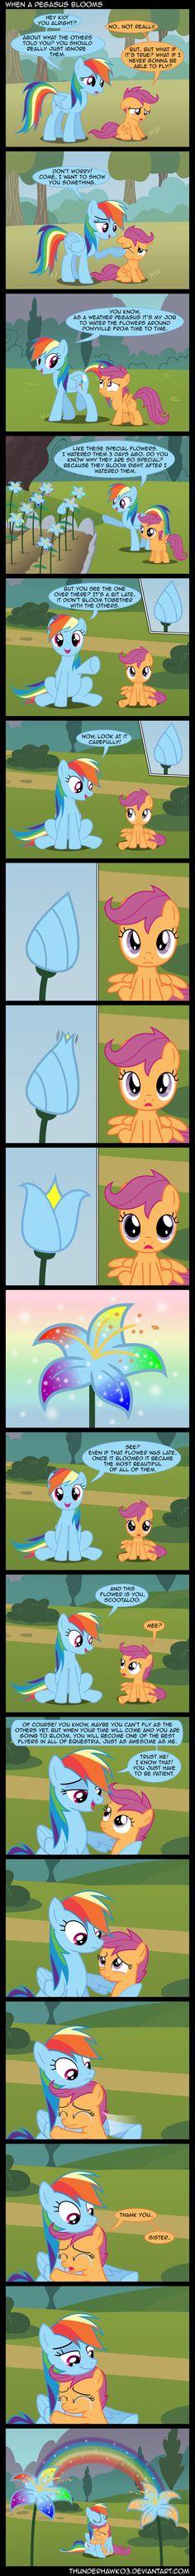 When+a+Pegasus+Blooms+by+Thunderhawk03.deviantart.com+on+@deviantART